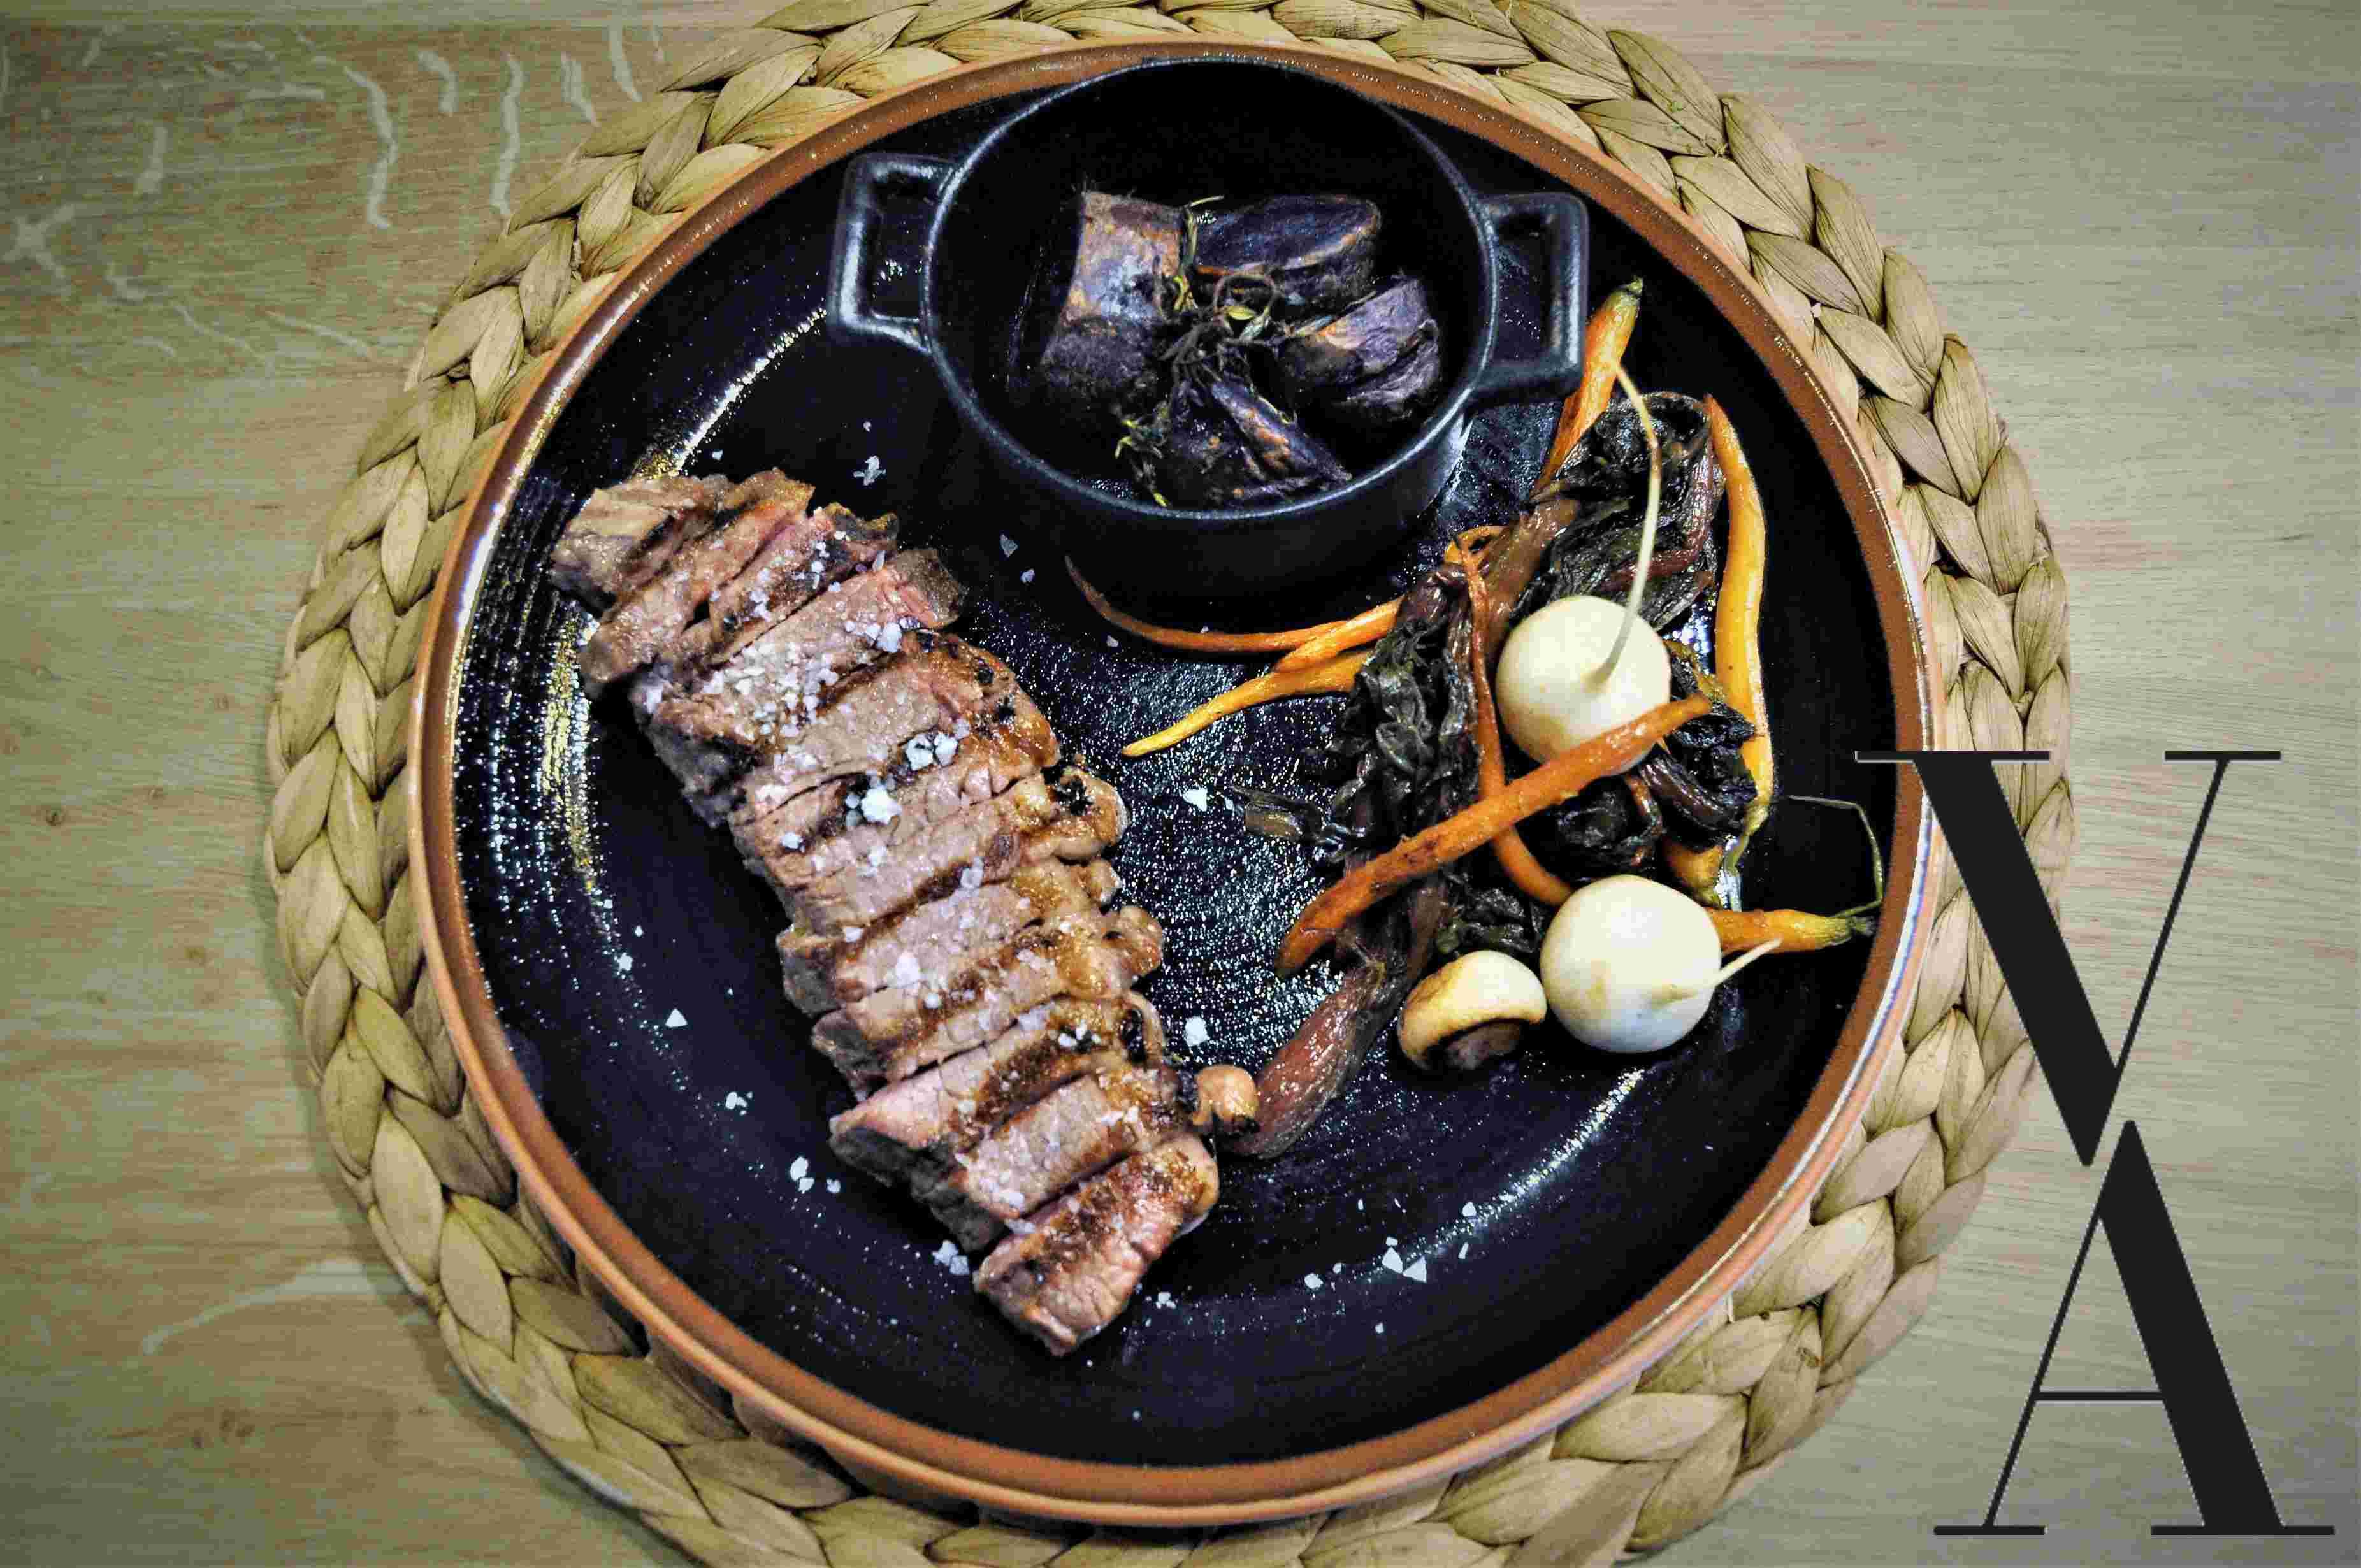 Carne de la sierra de Guadarrama D.O Restaurante Arado